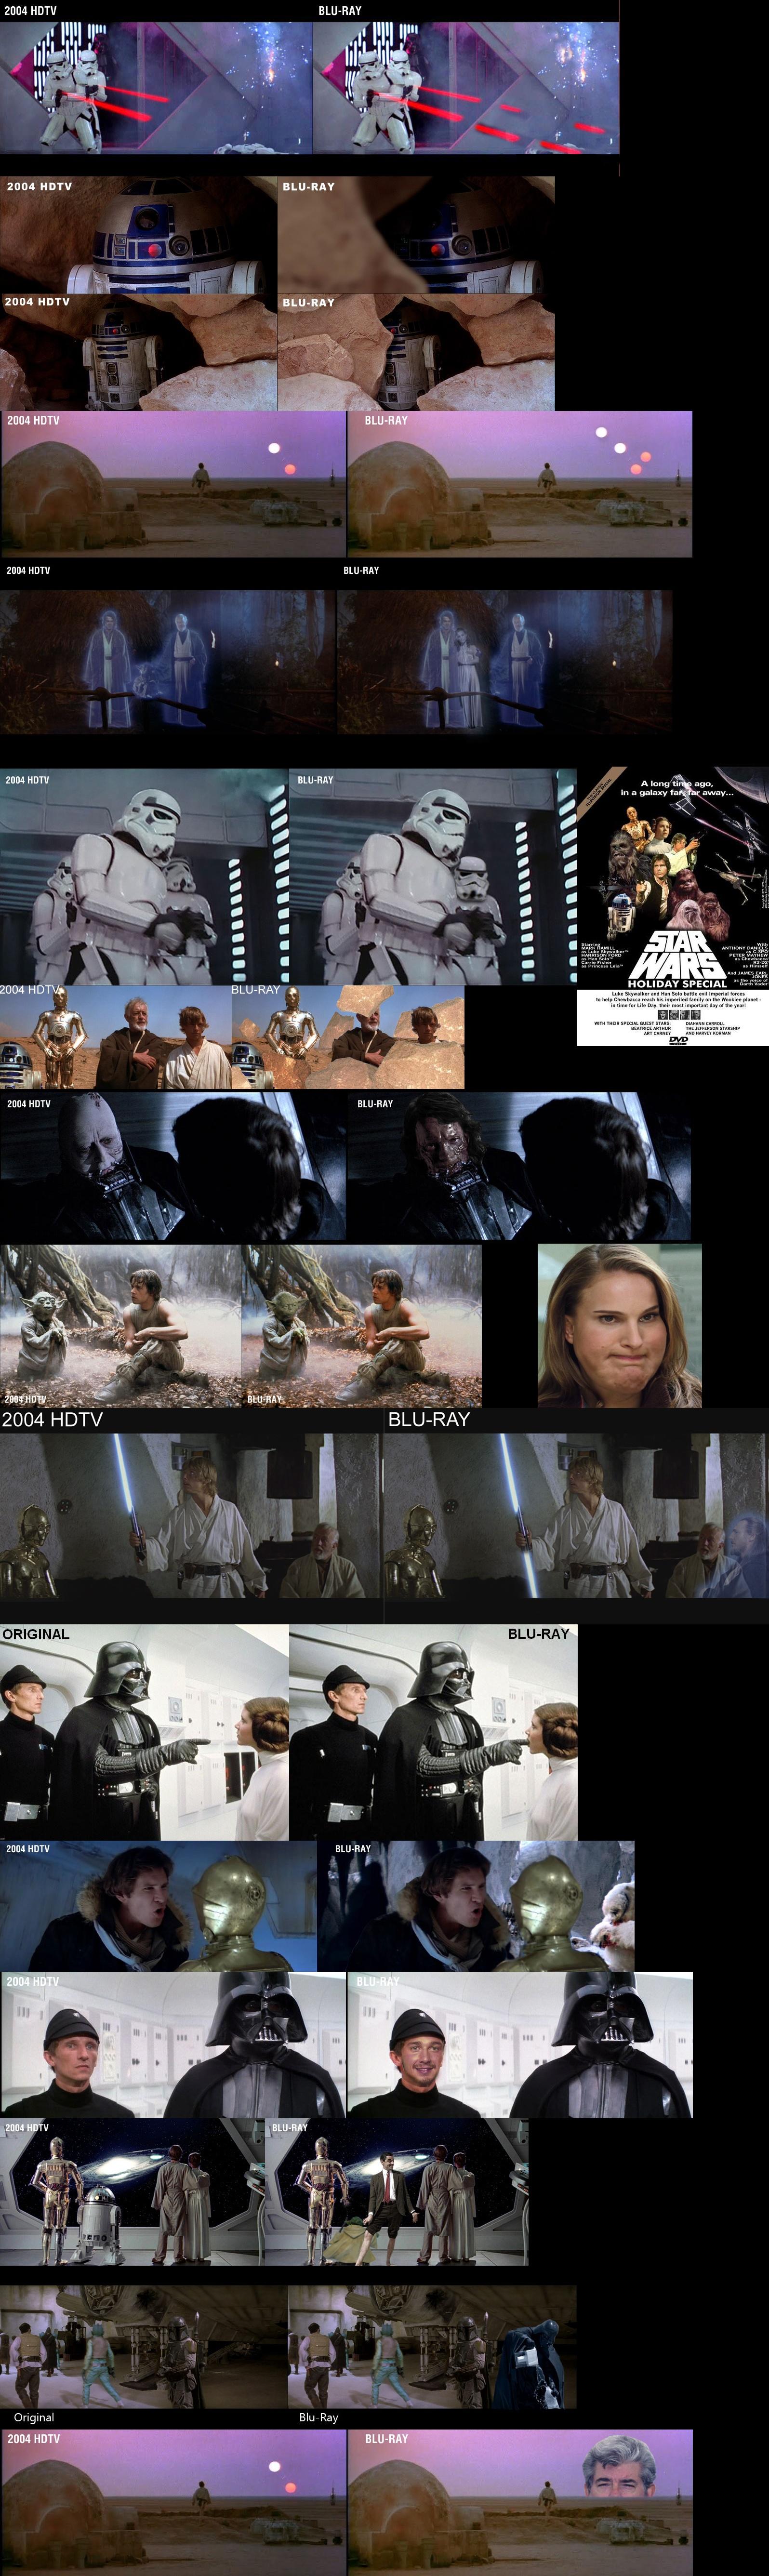 Star Wars original vs blu-ray